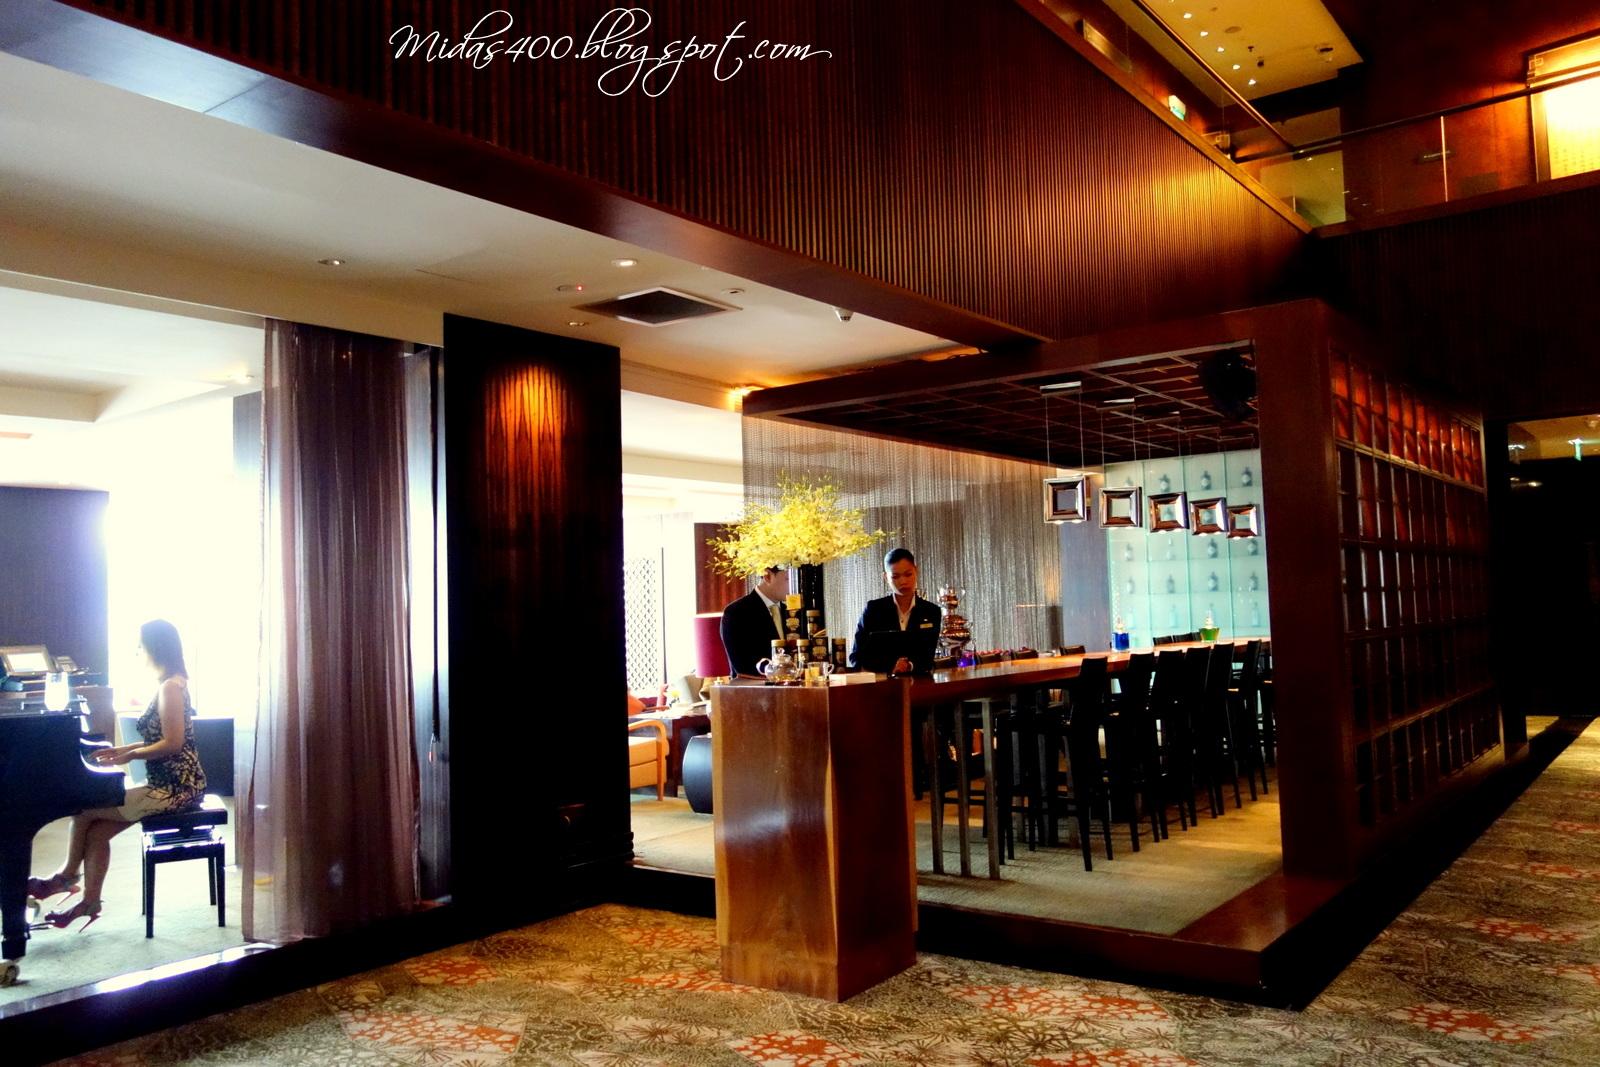 Midas food n travel blog afternoon tea at axis bar - Cuisine orientale blog ...